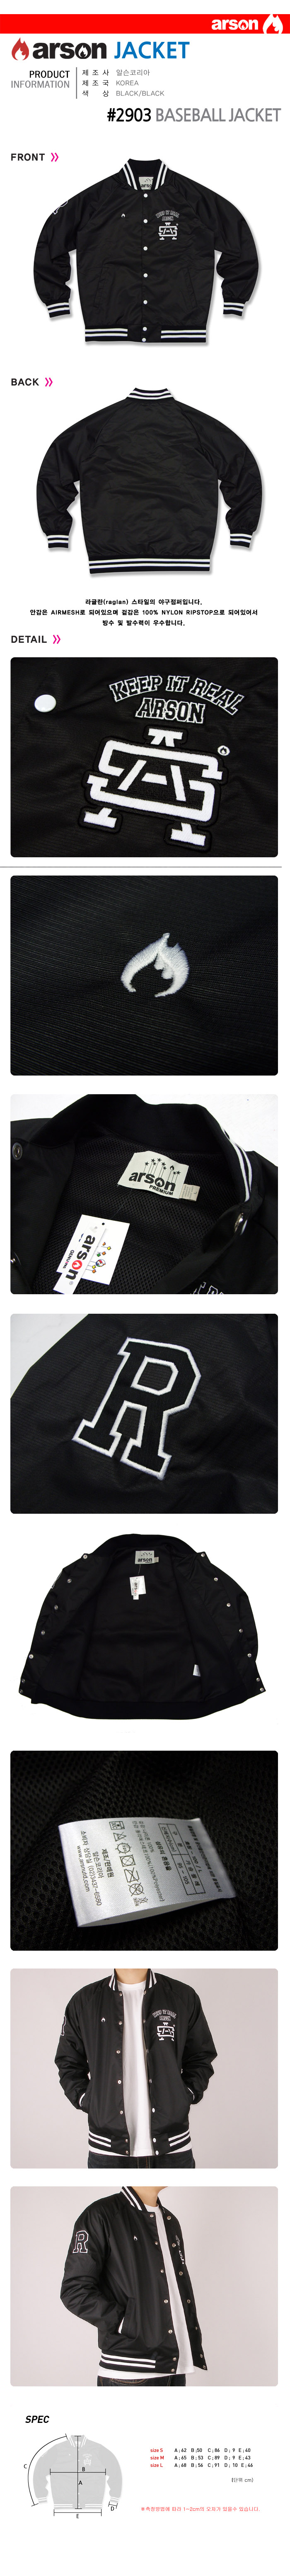 [ ARSON ] [ARSON] C2903  BASEBALL JACKET Stadium Jacket